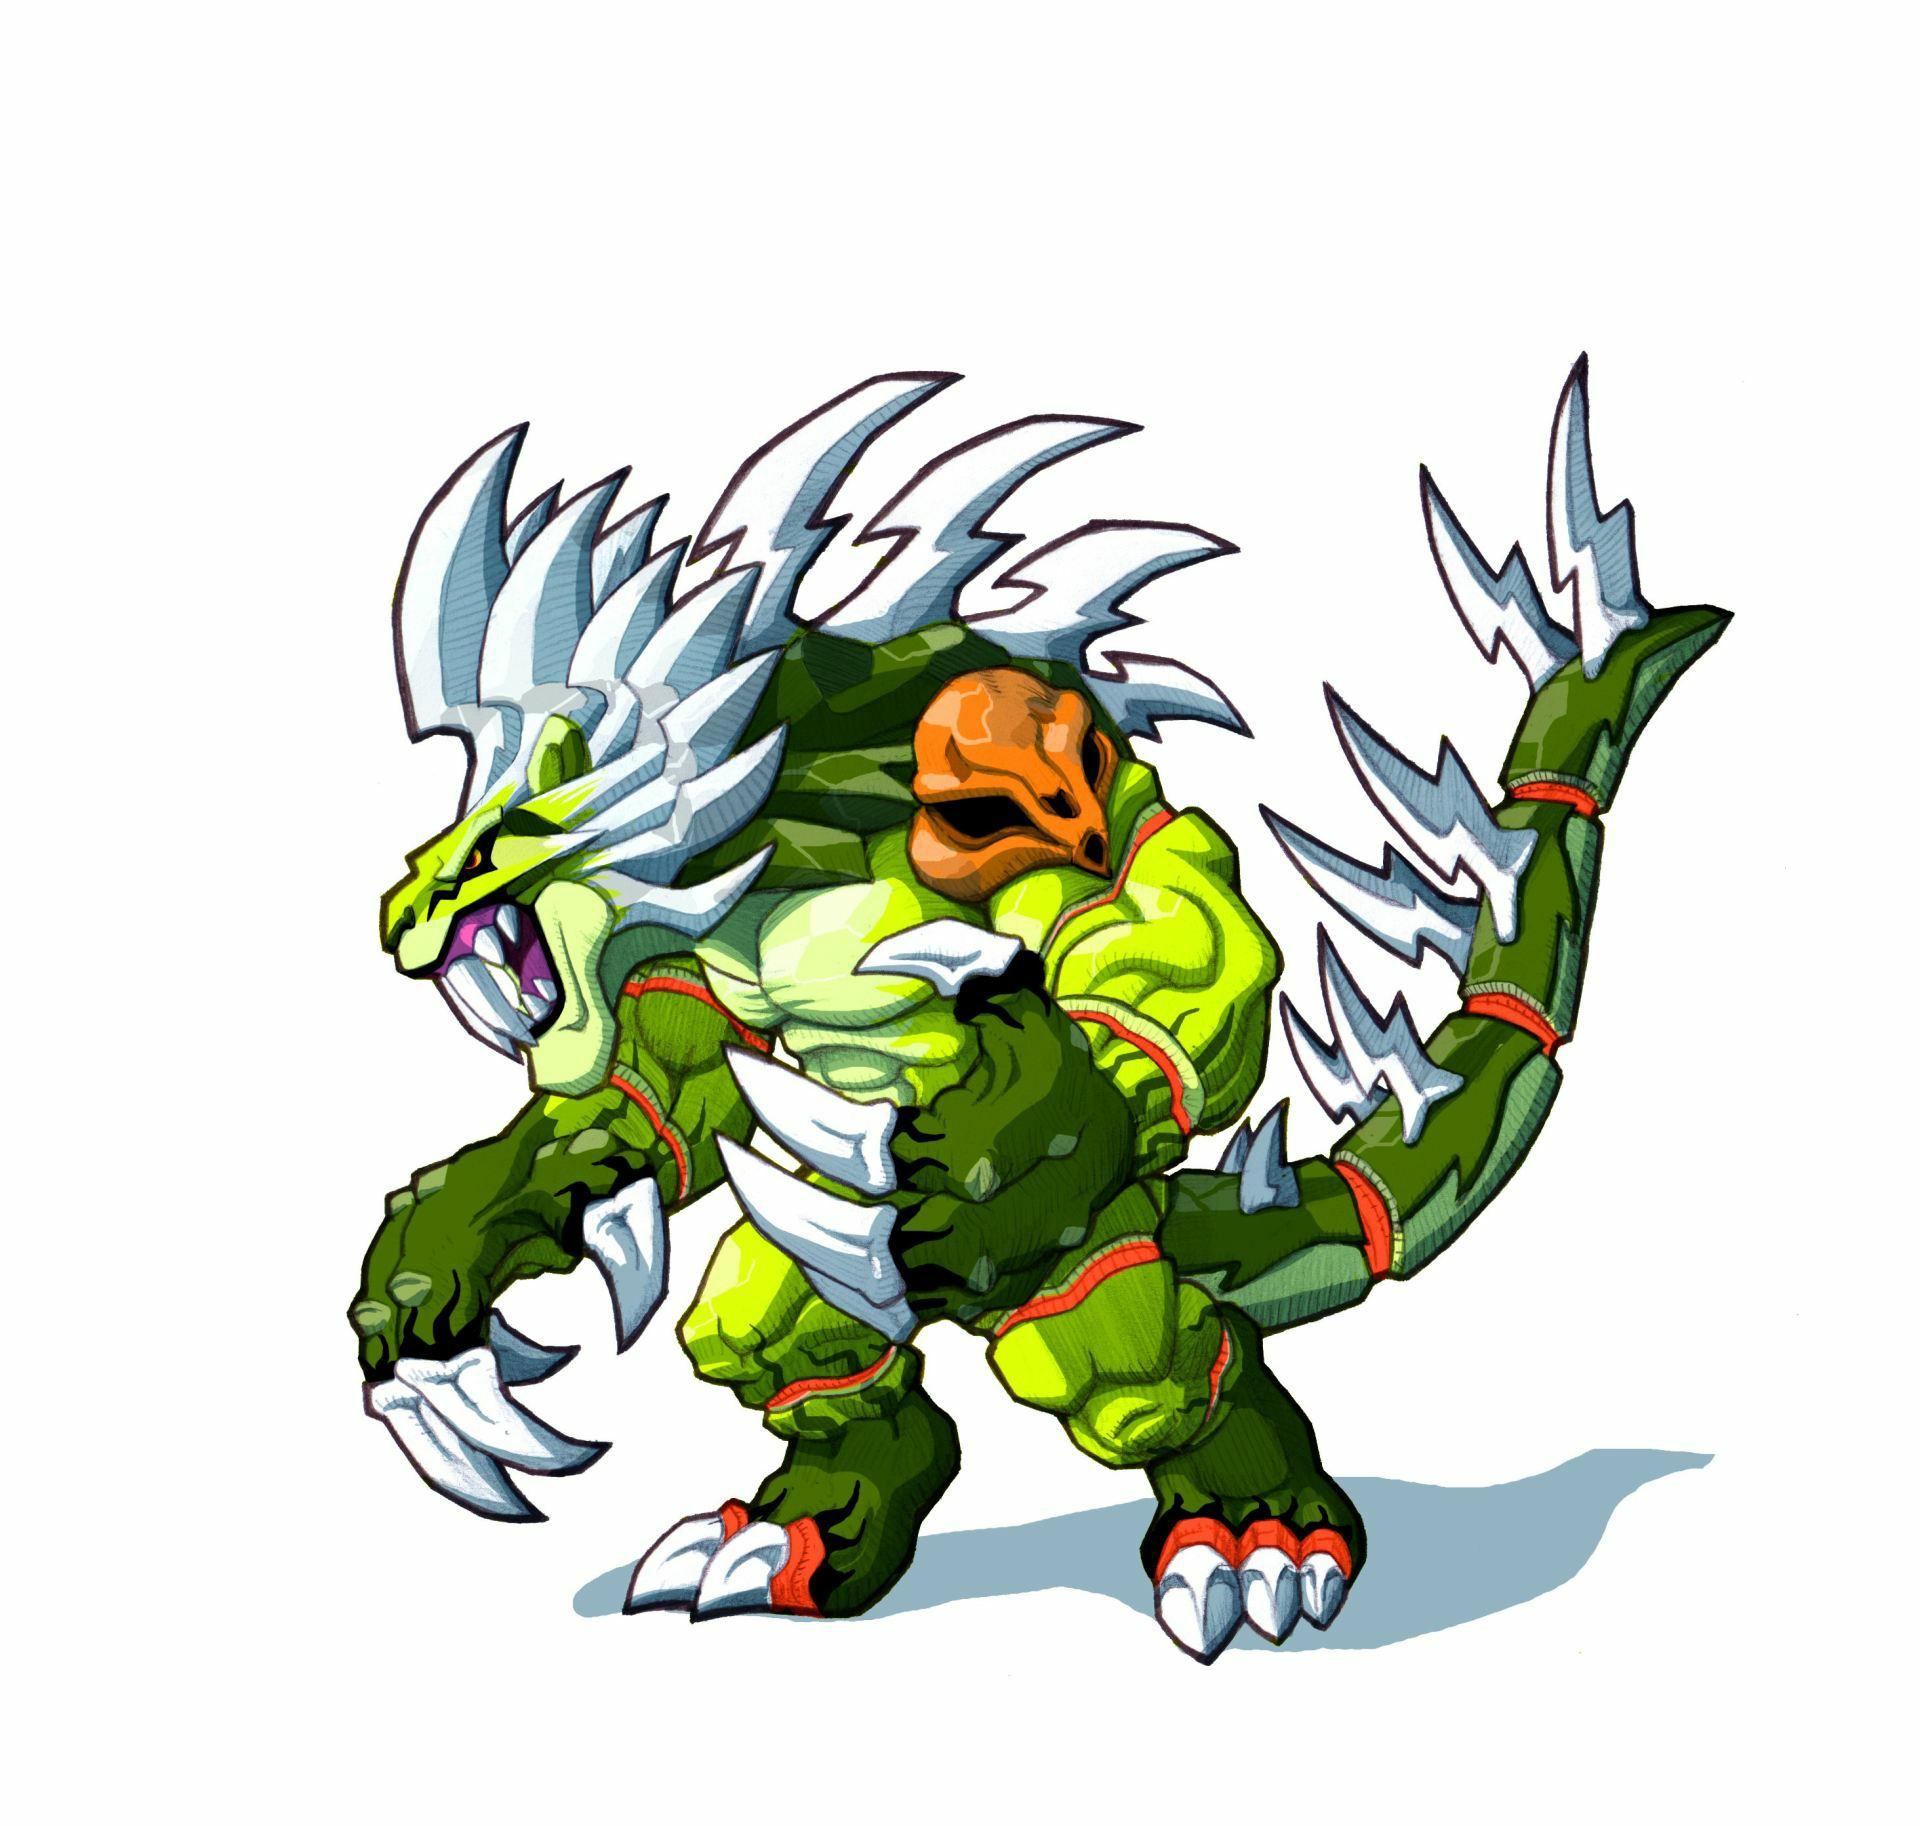 Dark icelion wiki invizimals fandom powered by wikia - Tigershark invizimals ...